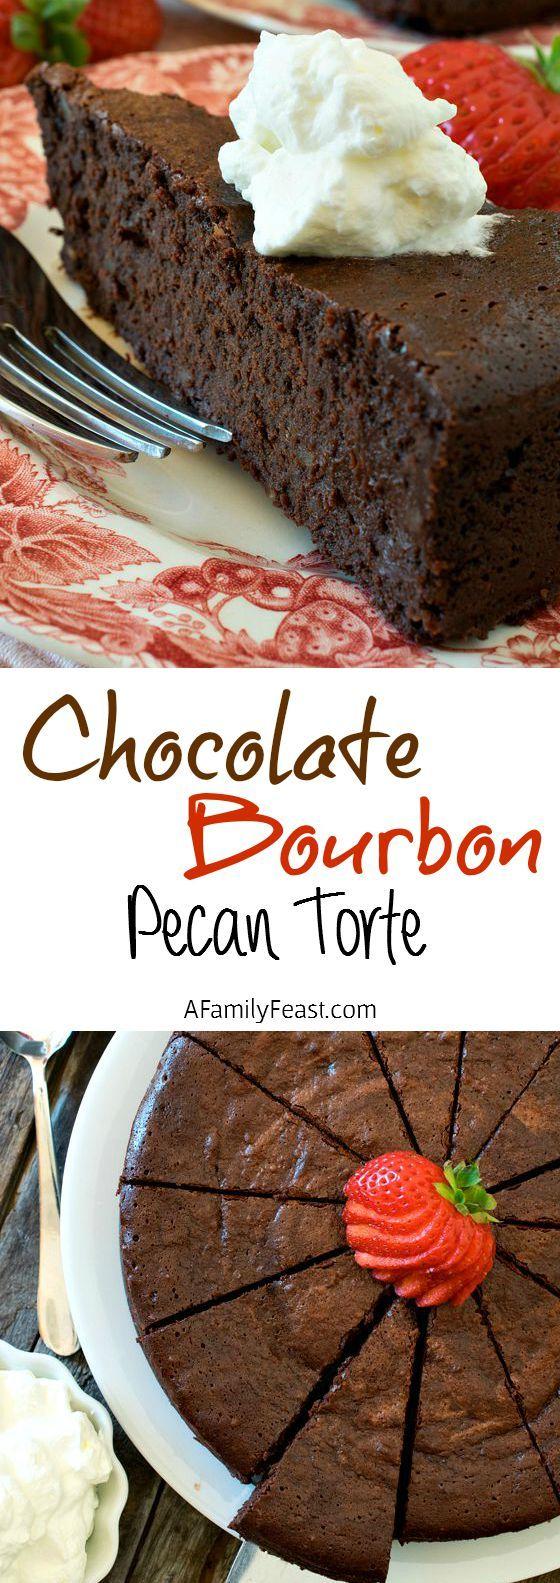 Chocolate-Bourbon Pecan Torte - A decadent, rich flourless chocolate ...